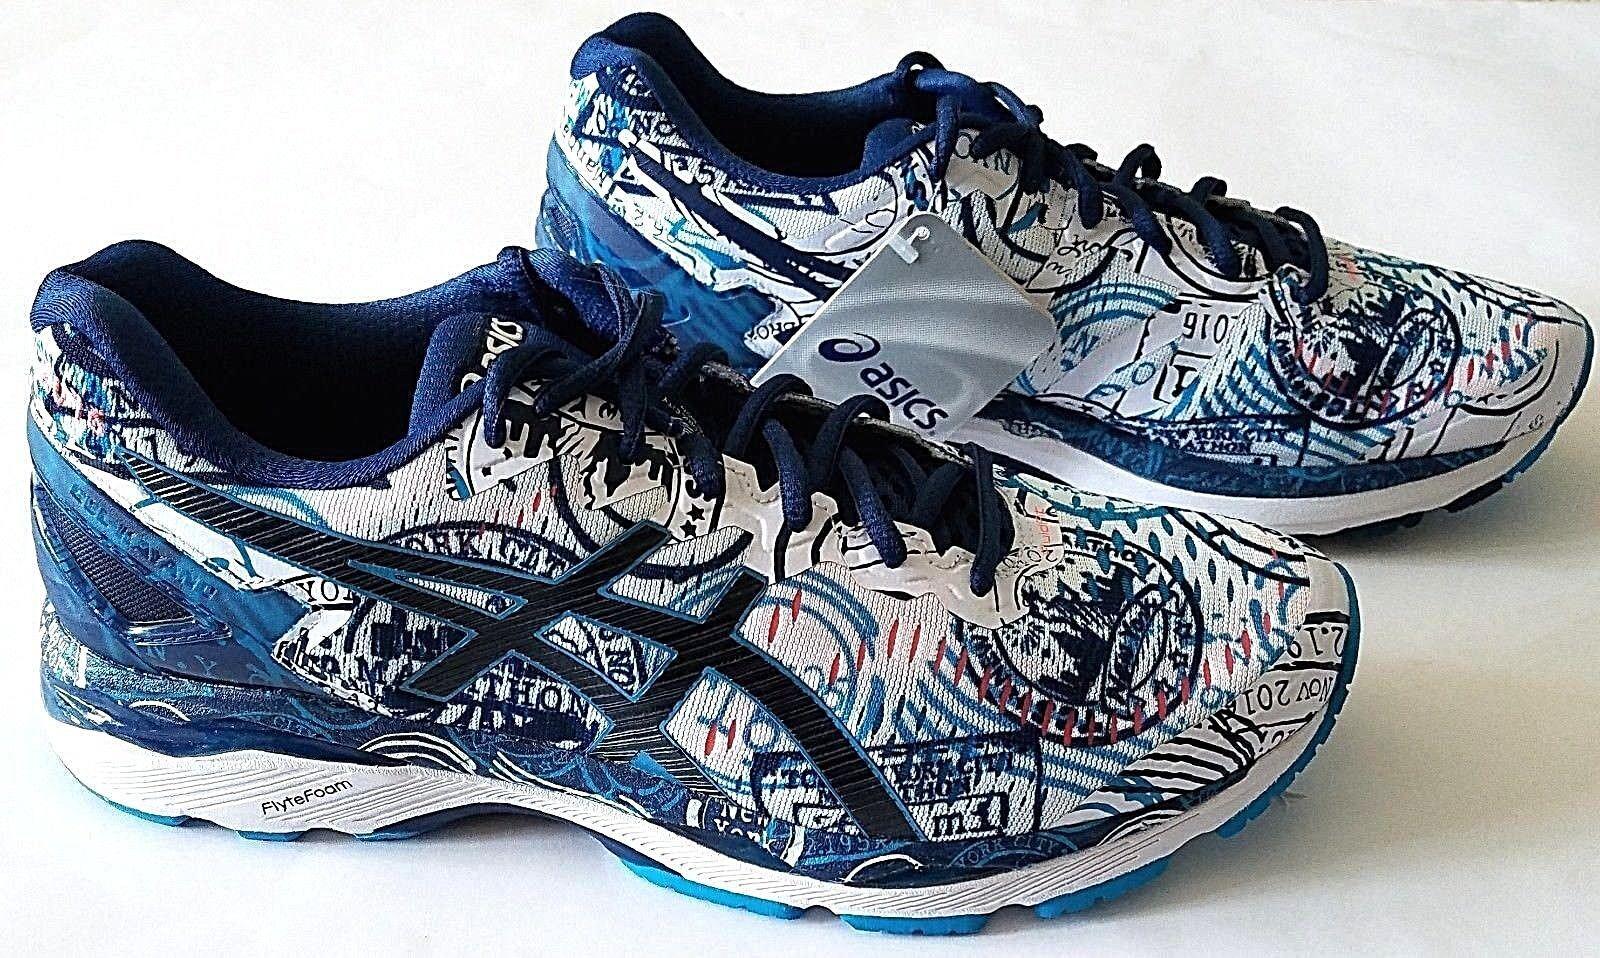 Asics Men's Gel Kayano 23 NYC Twenty Six Two Running Shoes Size 9